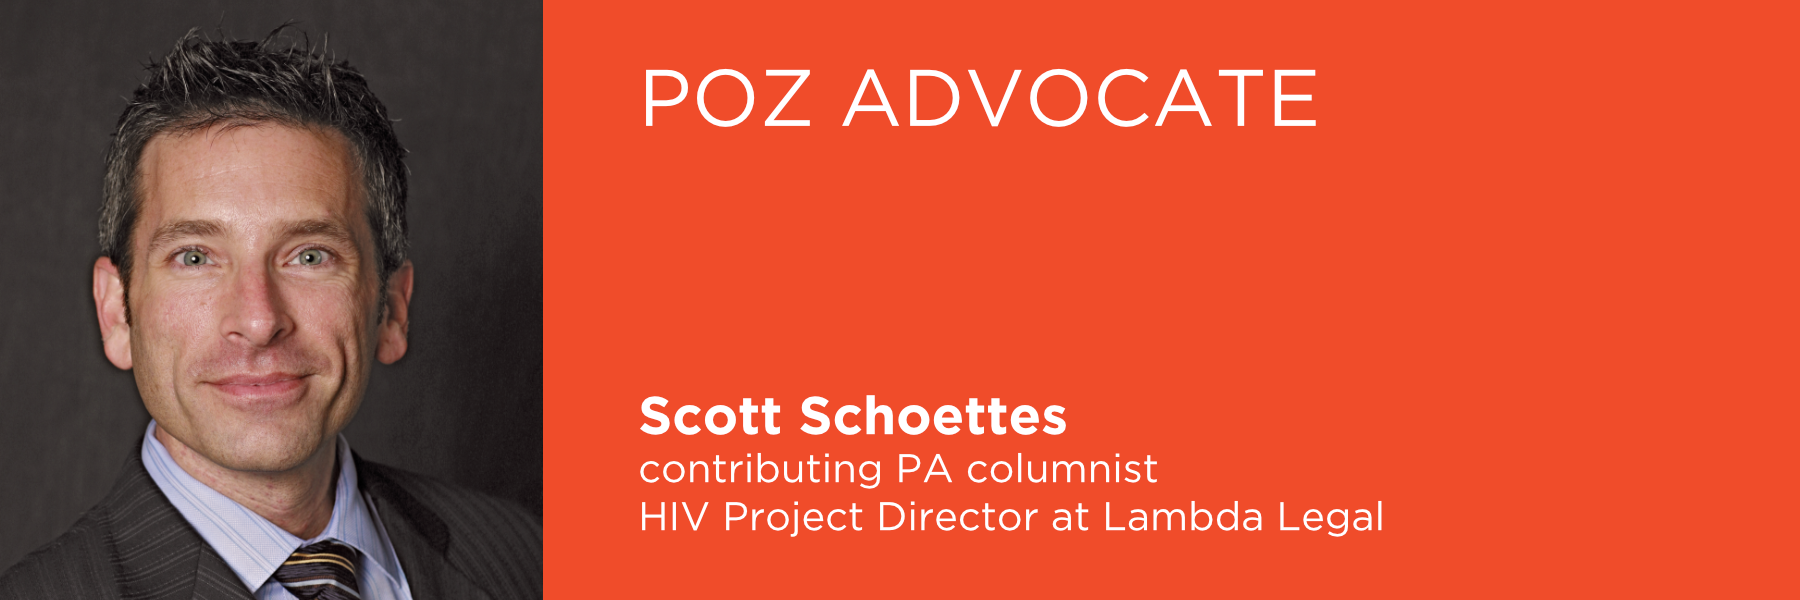 Poz Advocate column @ PA - Scott Schoettes